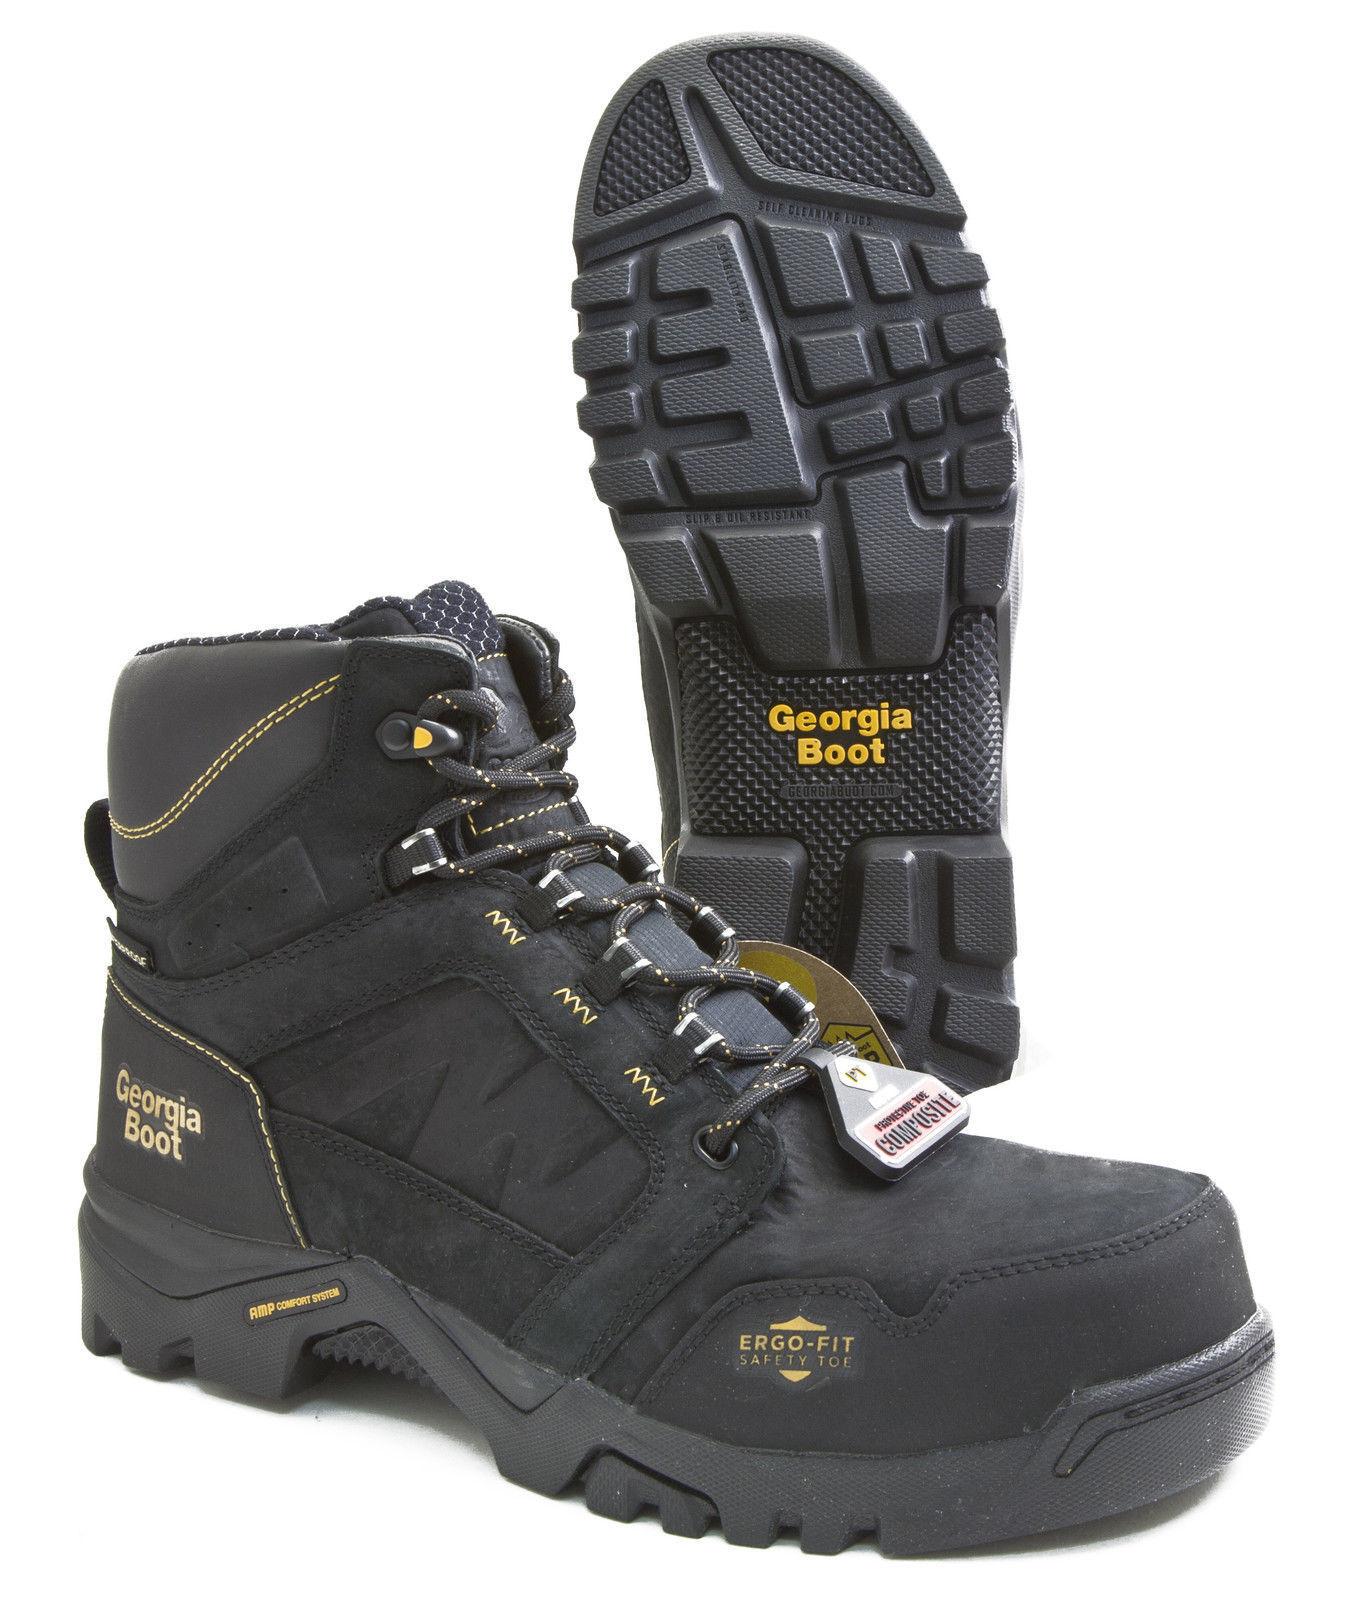 Georgia GB00130 6  Amplitude Composite Toe Waterproof Work Boot